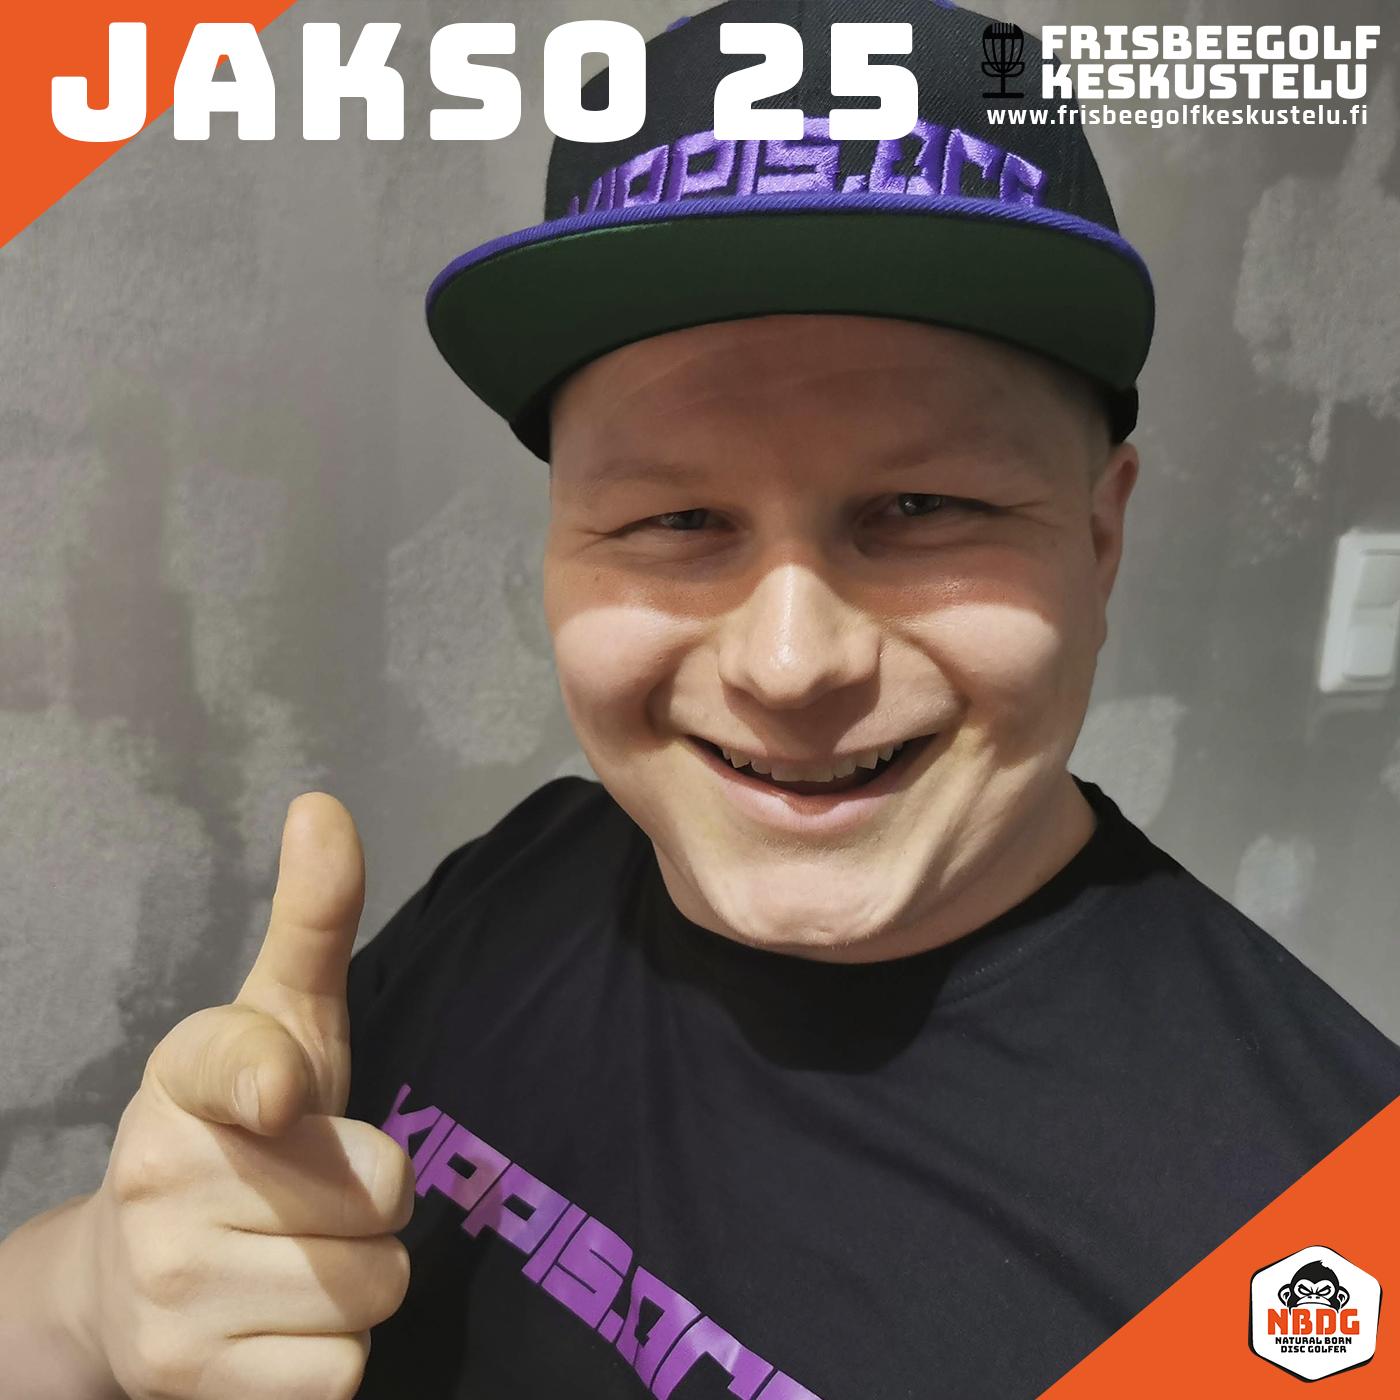 Frisbeegolfkeskustelu jakso #25 - vieraana Jere Pohjankoski